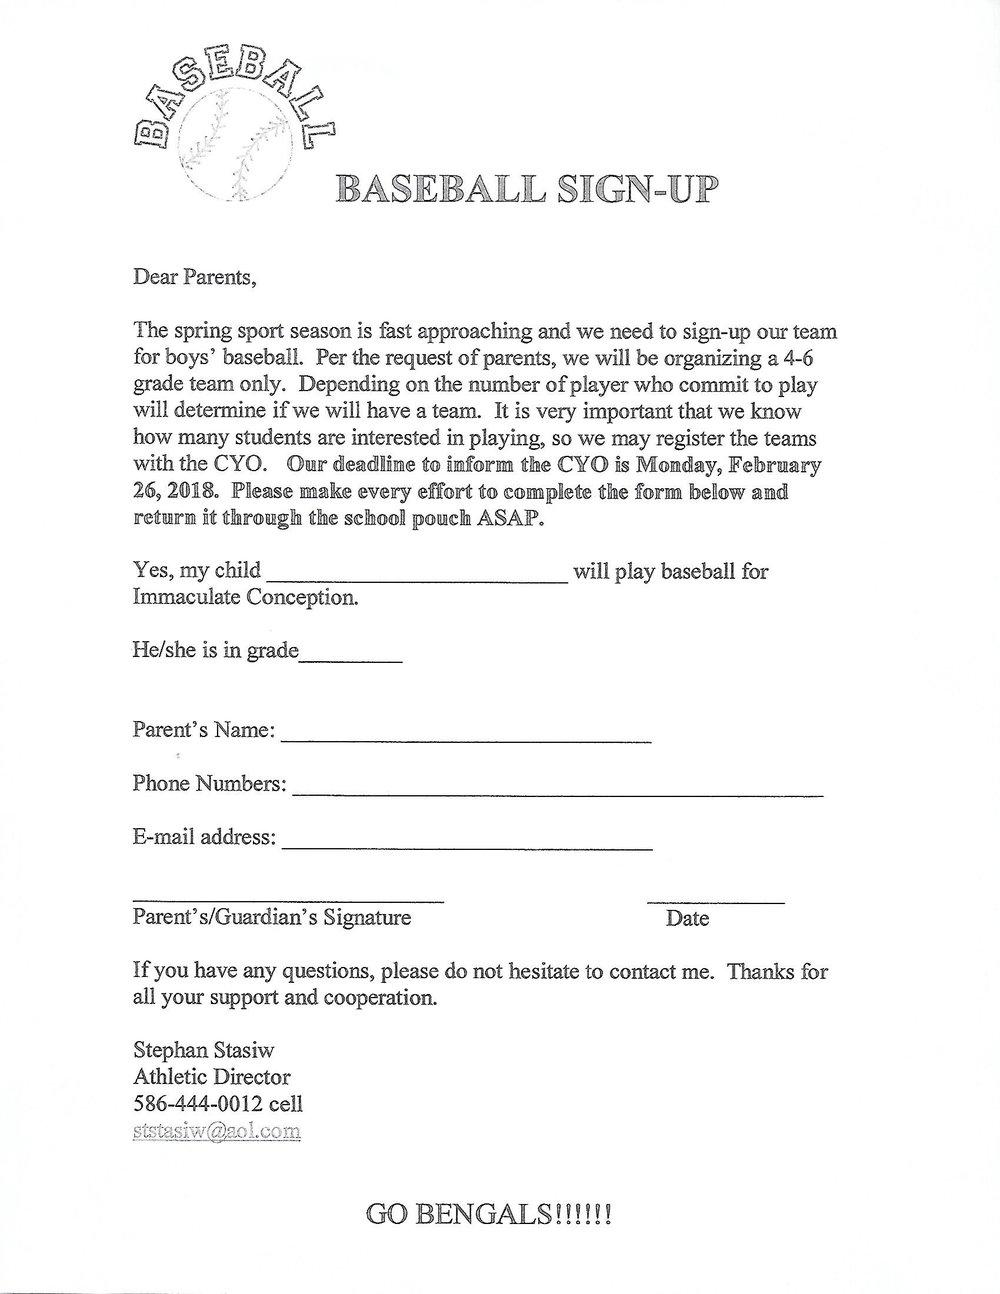 Baseball Signup.jpg